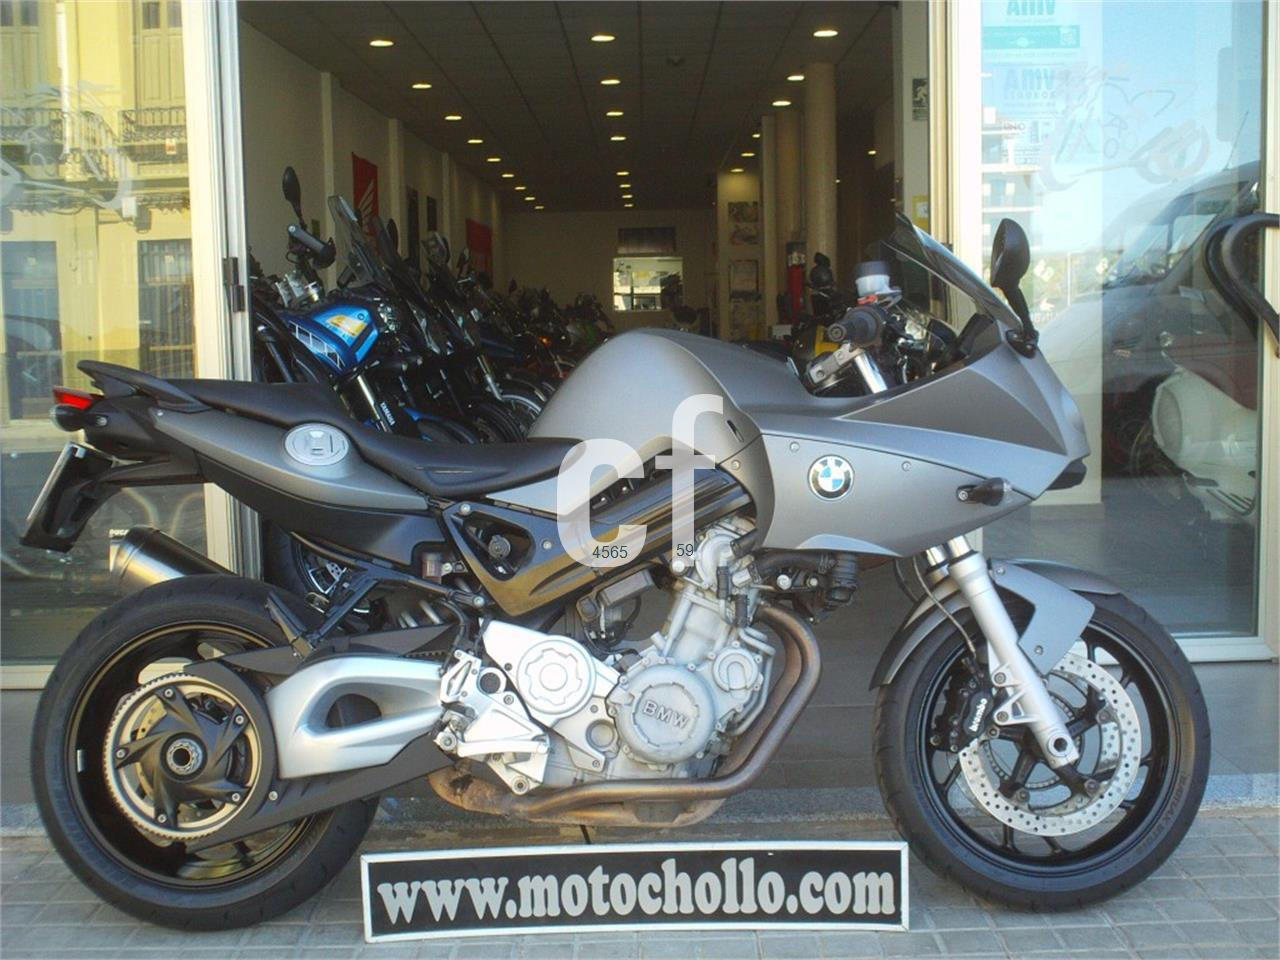 BMW F 800 S de venta